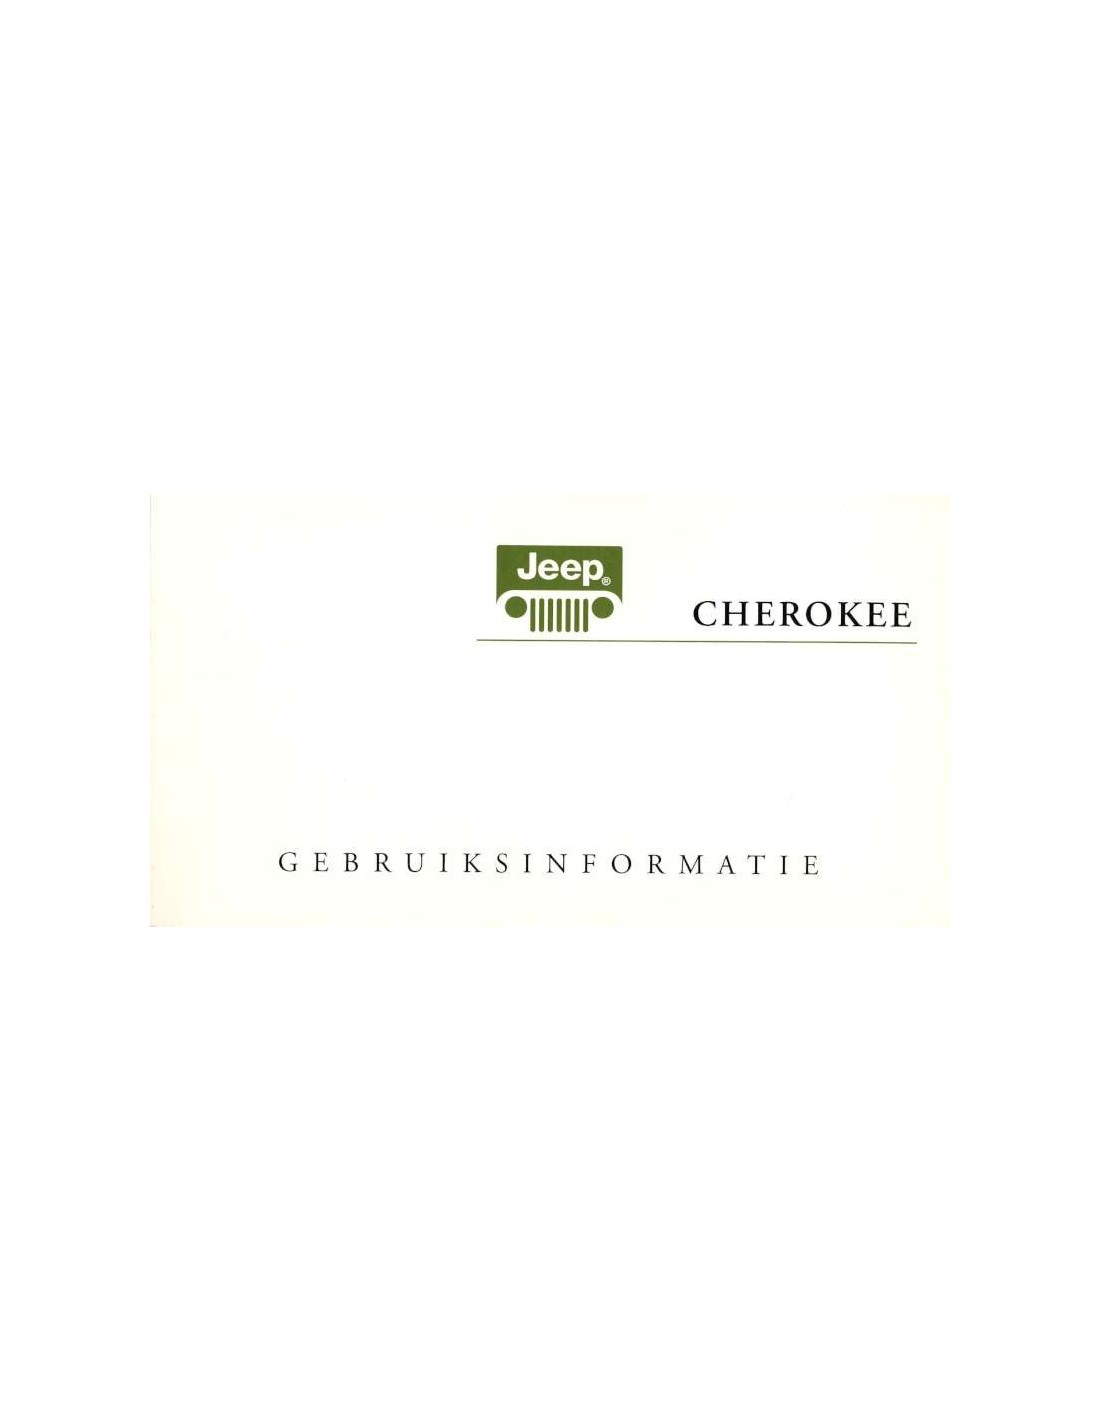 jeep cherokee owners manual 2006